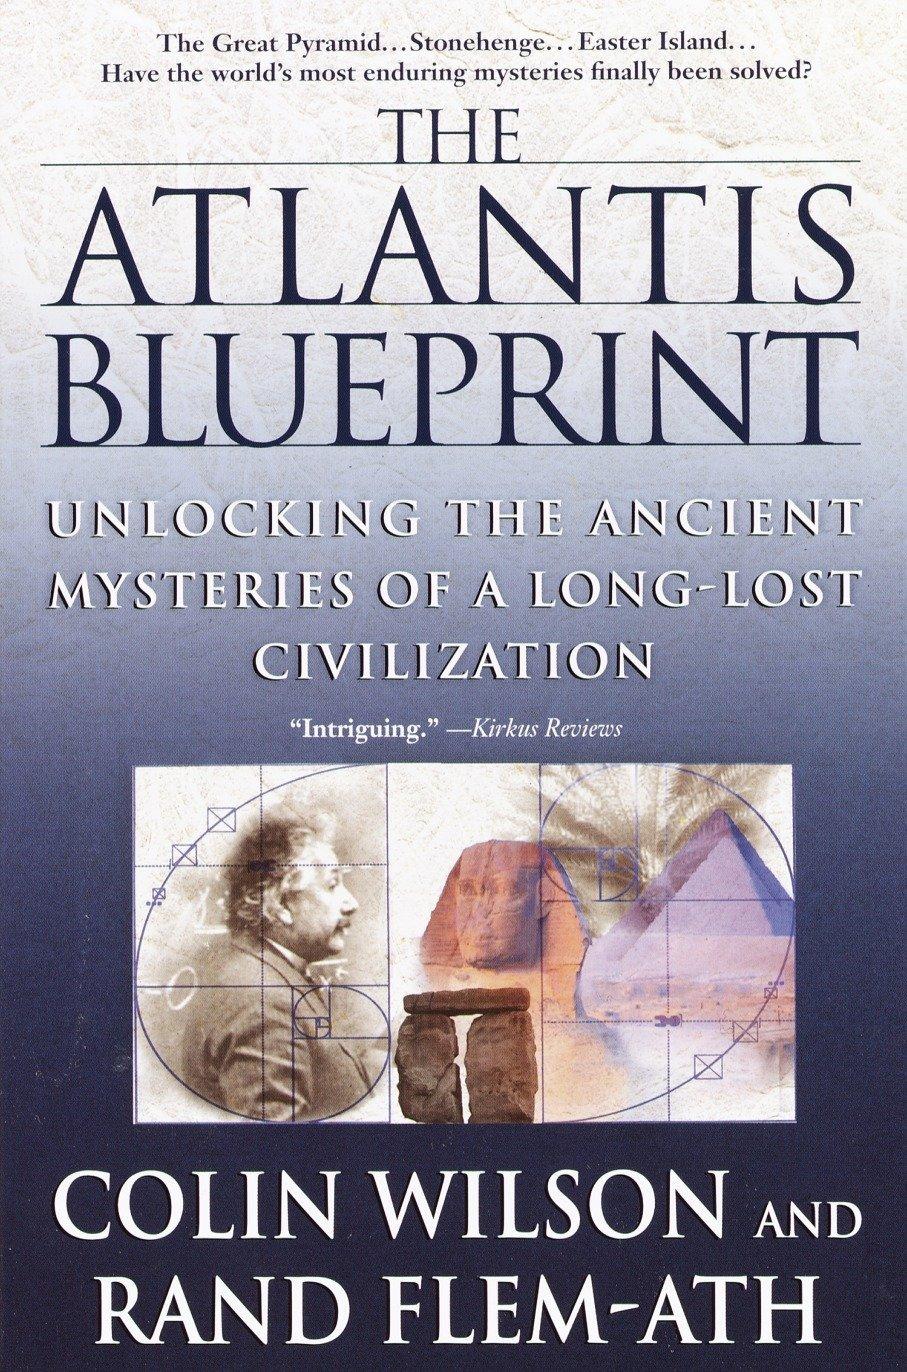 Atlantis Blueprint: Unlocking the Ancient Mysteries of a Long-Lost Civilization